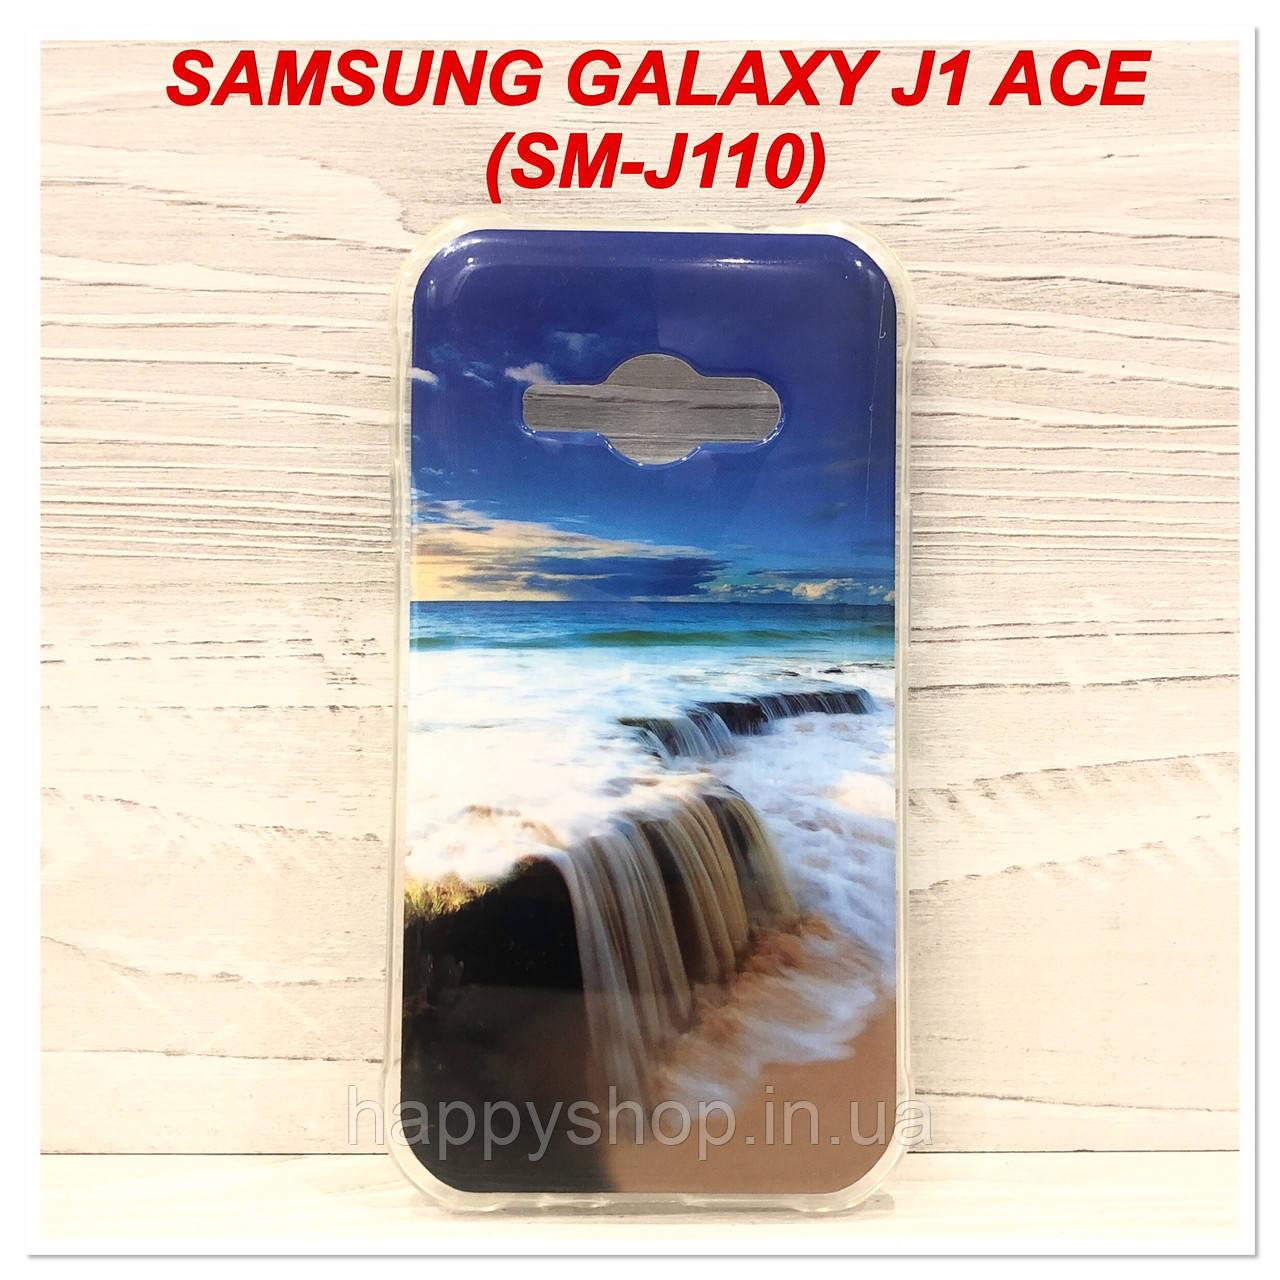 Силиконовый чехол с рисунком для Samsung Galaxy J1 Ace (SM-J110) Waterfall